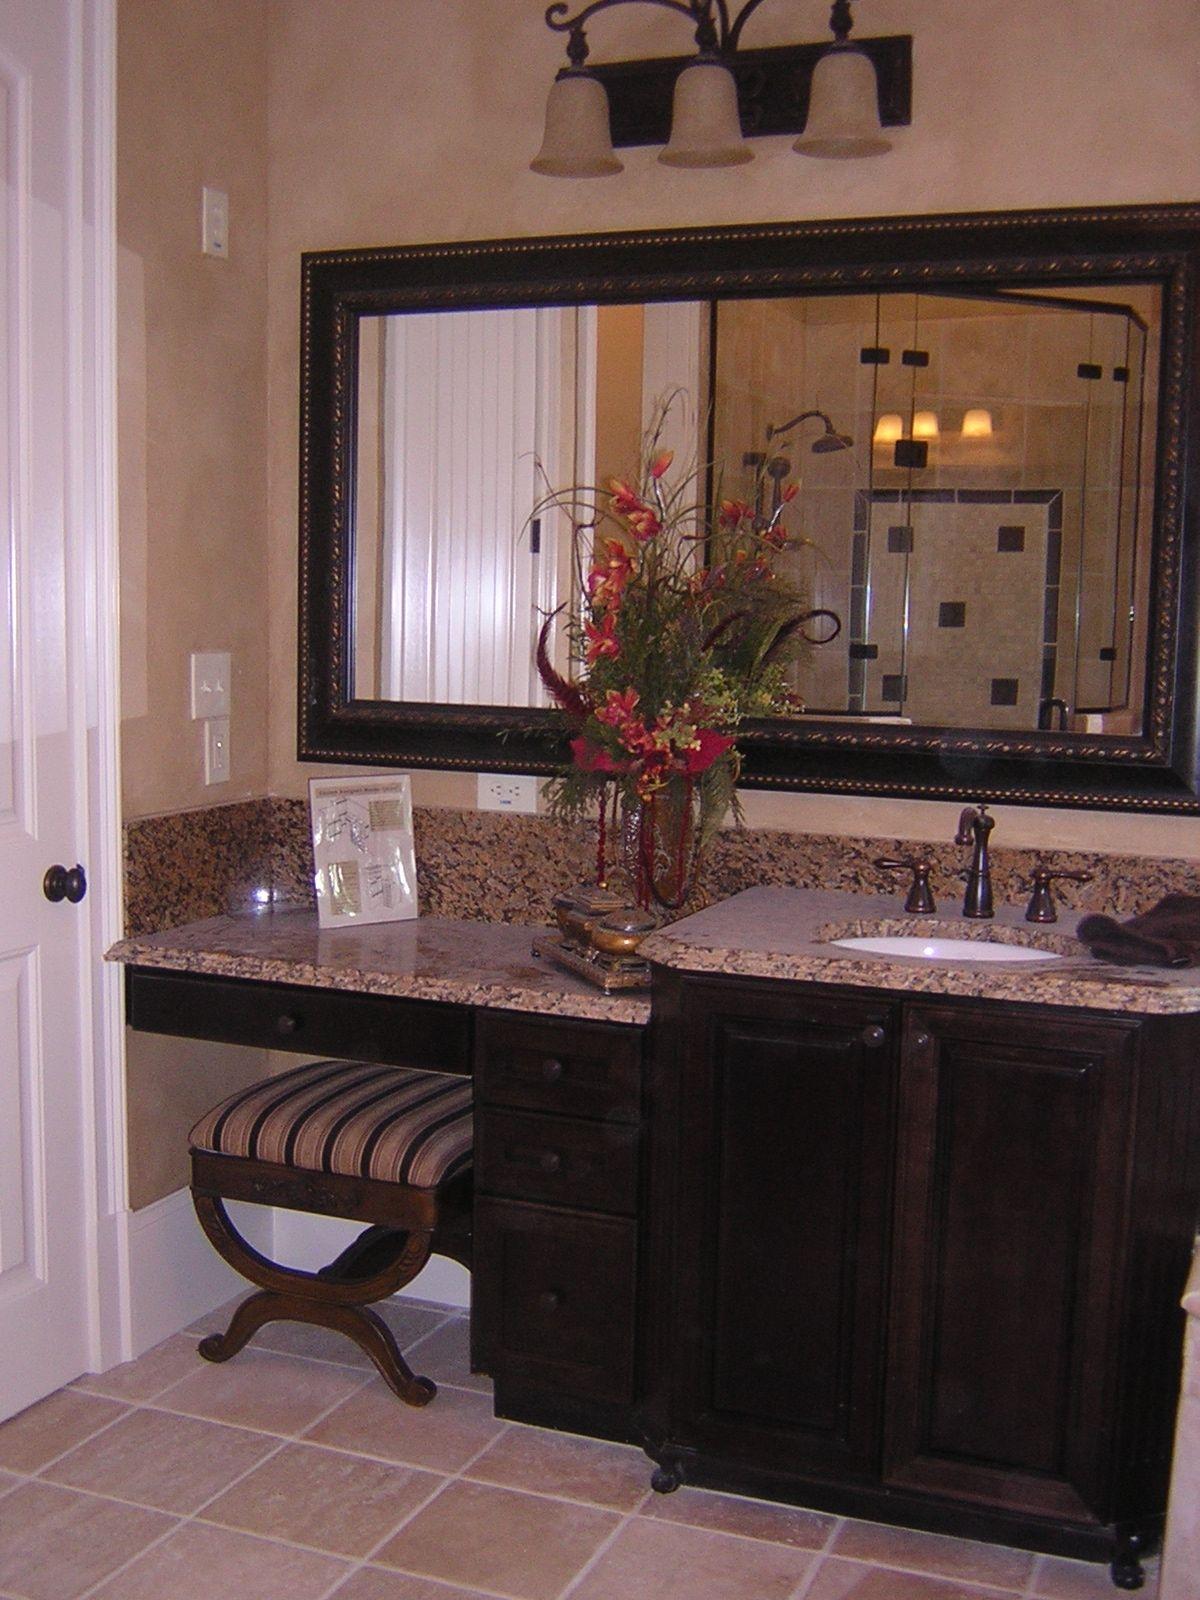 Dark Cherry Cabinets With Vanity Sitting E Bathroom Sink Renos Master